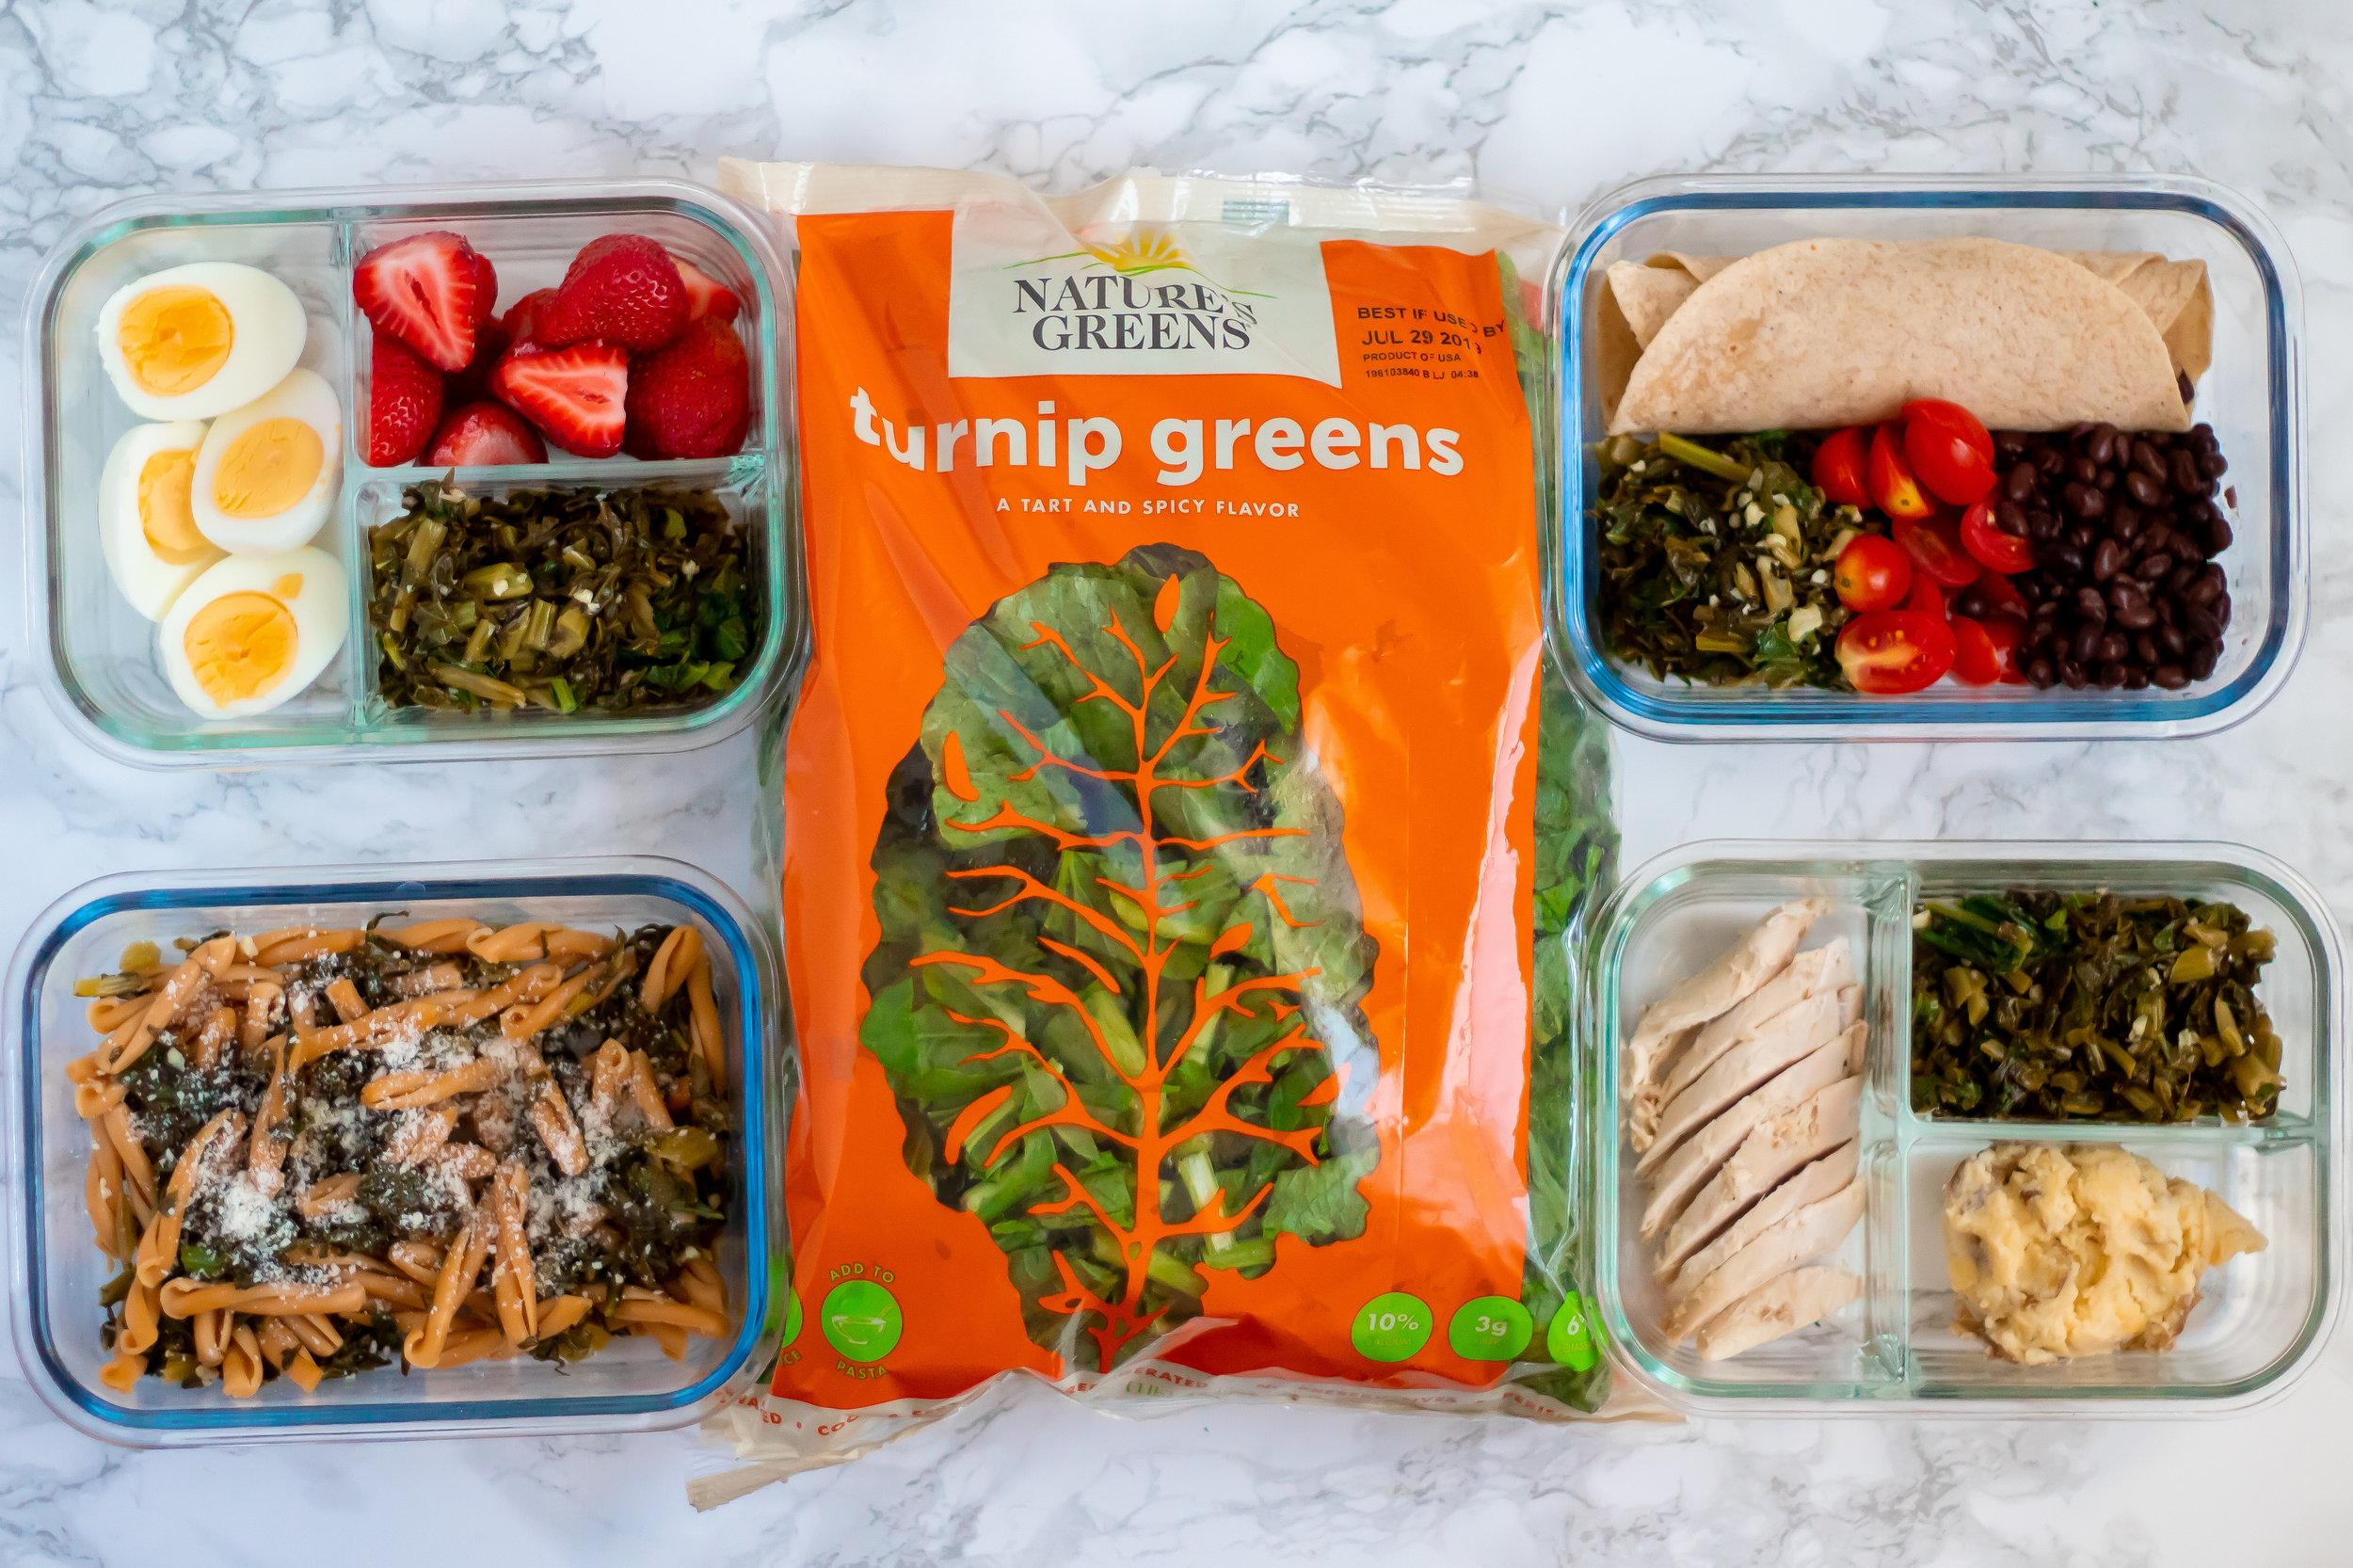 Nature's Greens turnip greens meal prep horizontal.jpg